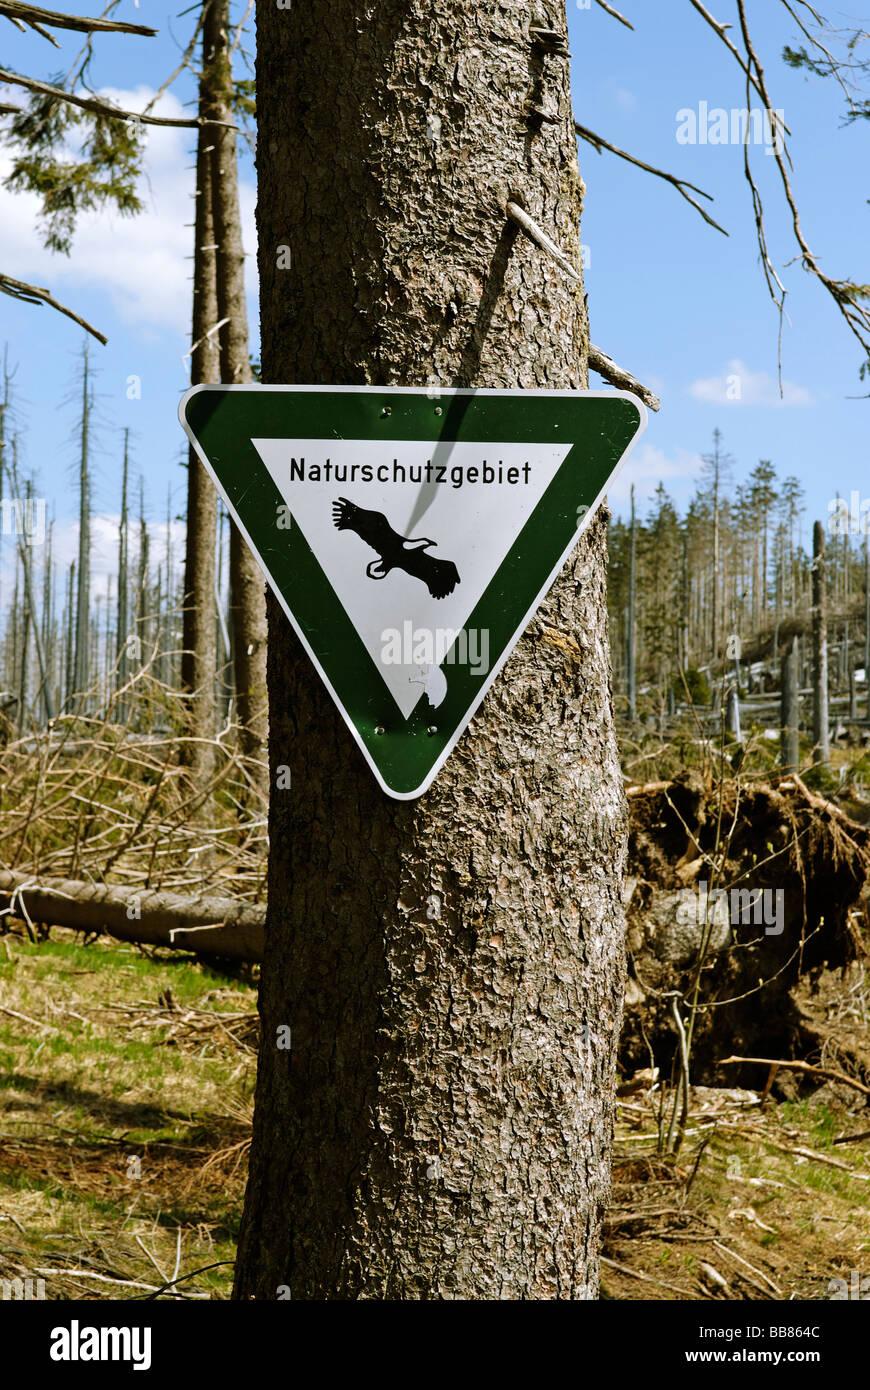 Sign Naturschutzgebiet, nature reserve, Dreisessel, Bavarian Forest, Lower Bavaria, Germany, Europe - Stock Image